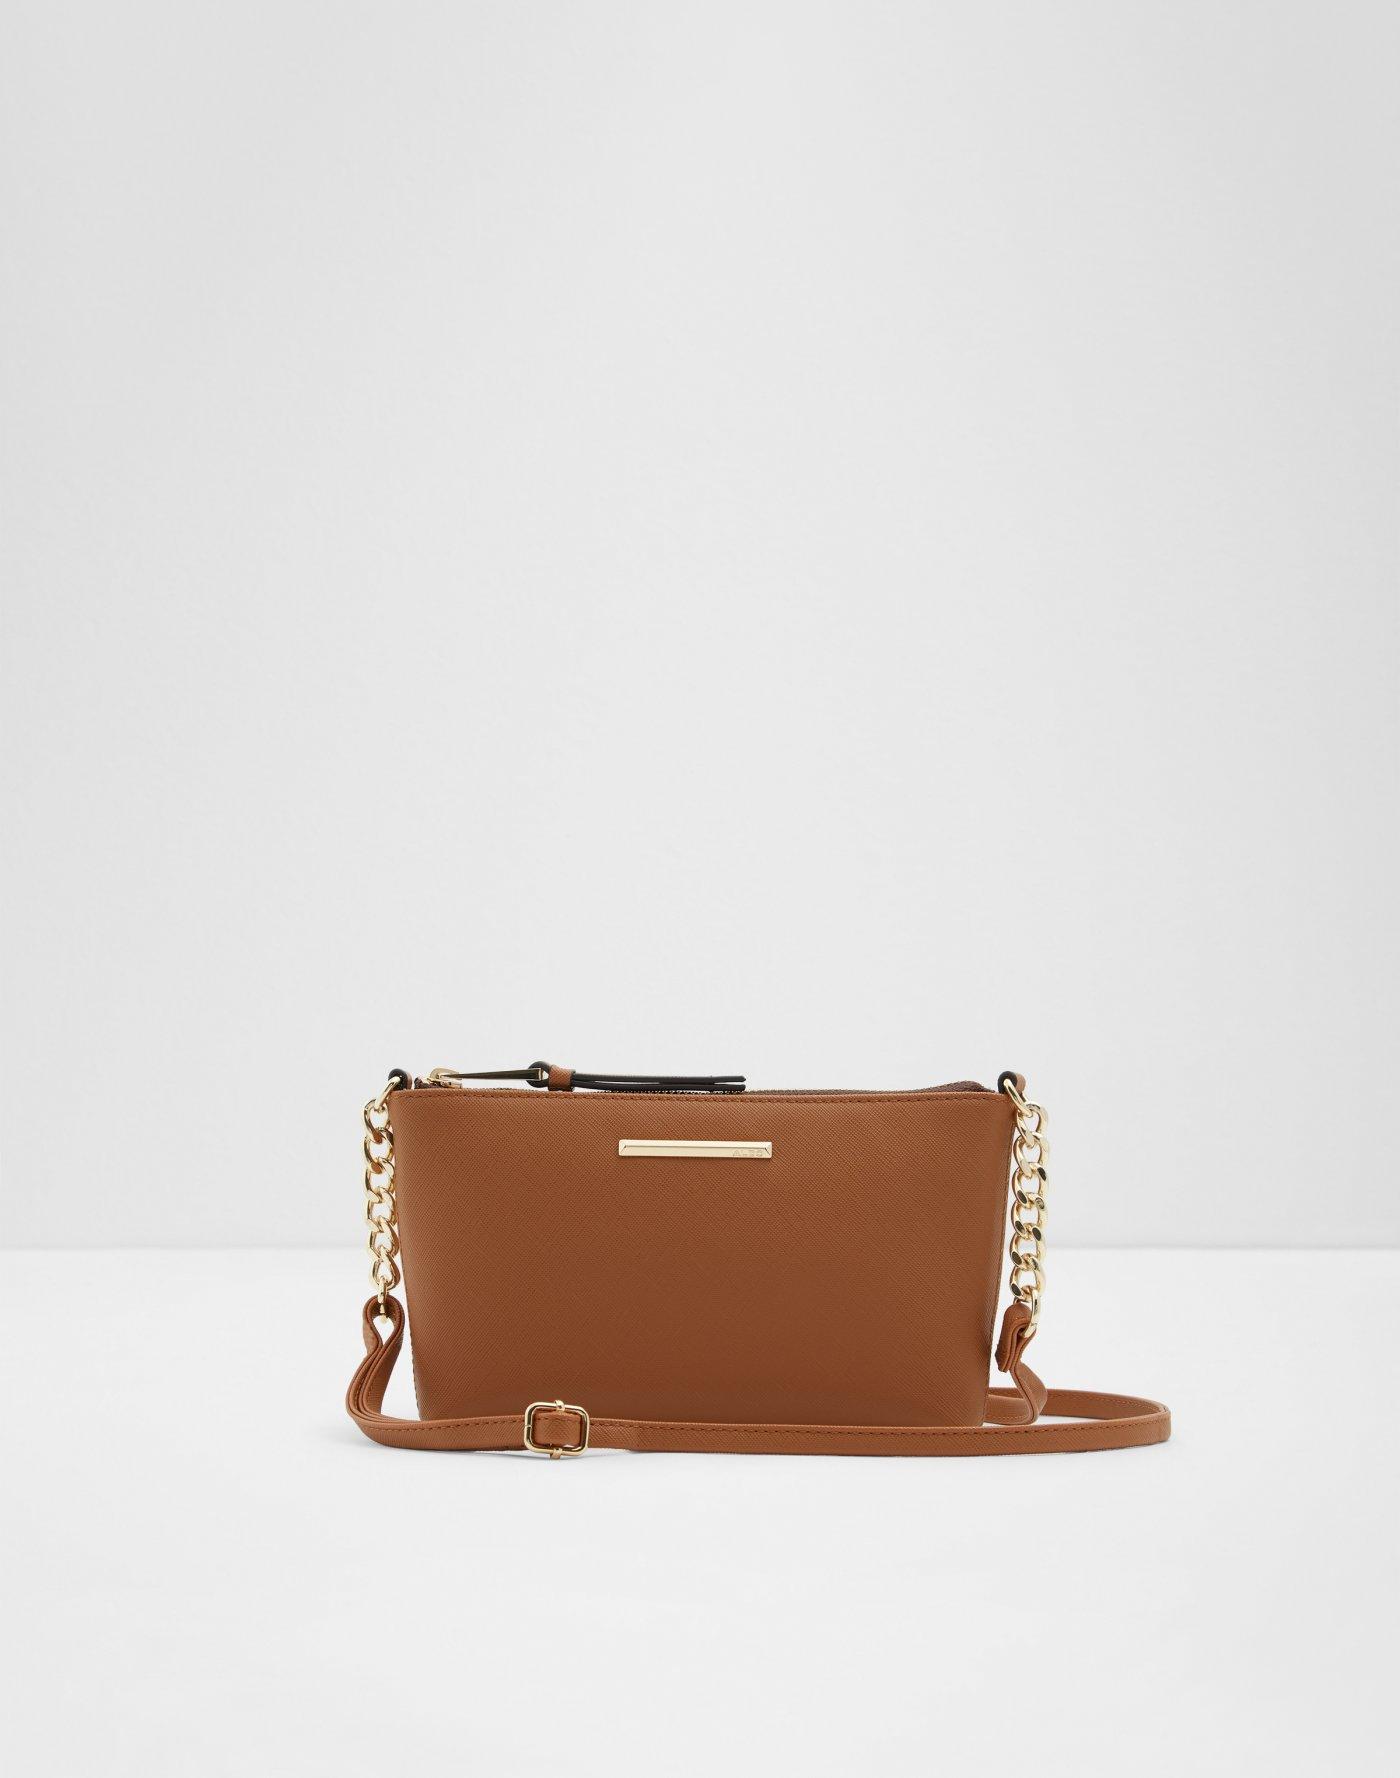 df66ebc34c32 All Handbags